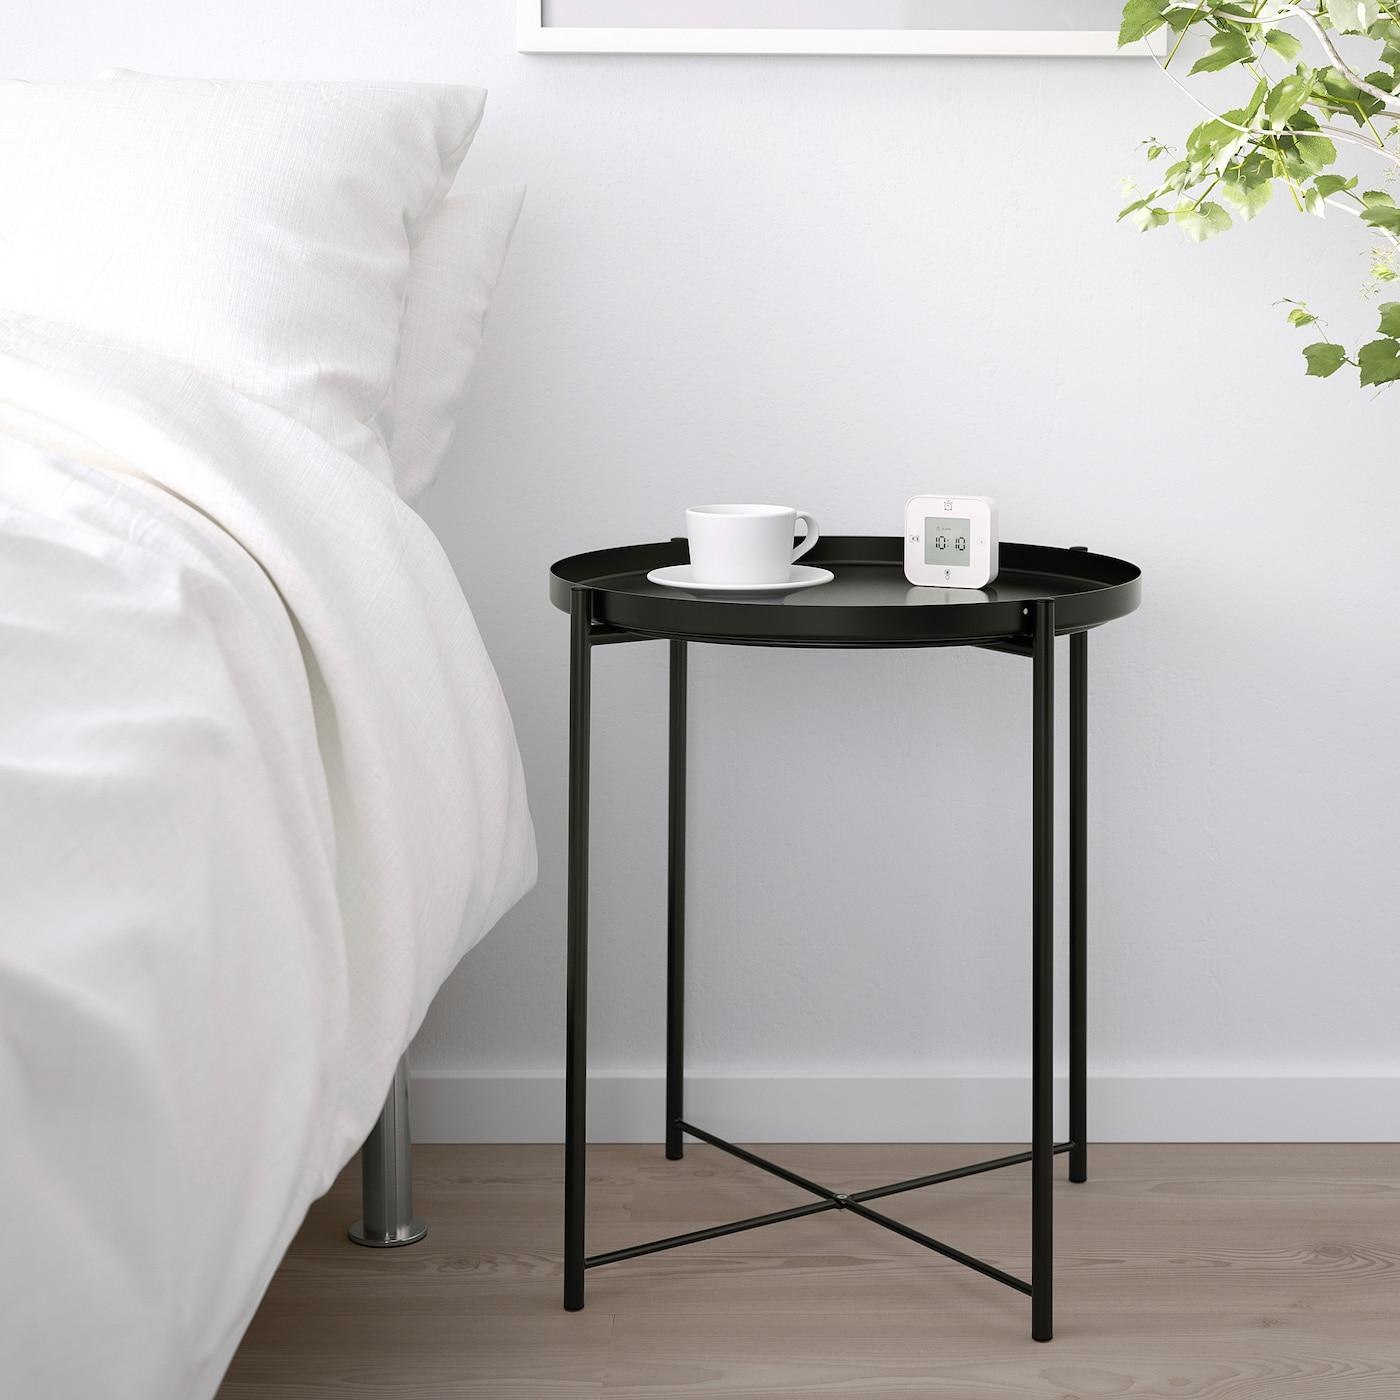 Tavolino Che Diventa Tavolo Ikea gladom tavolino vassoio - nero 45x53 cm